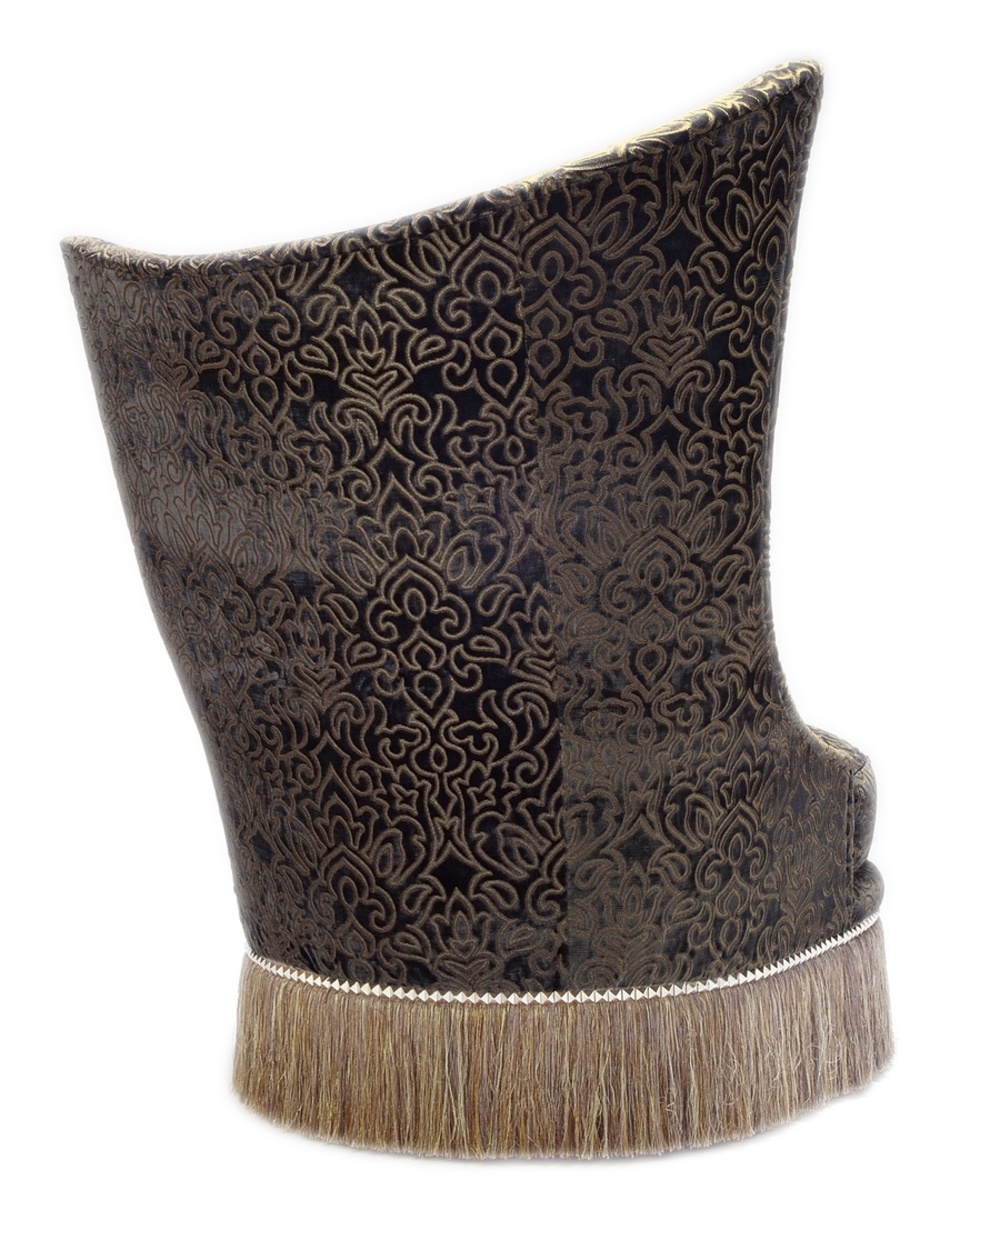 Marge Carson - Artemis Chair